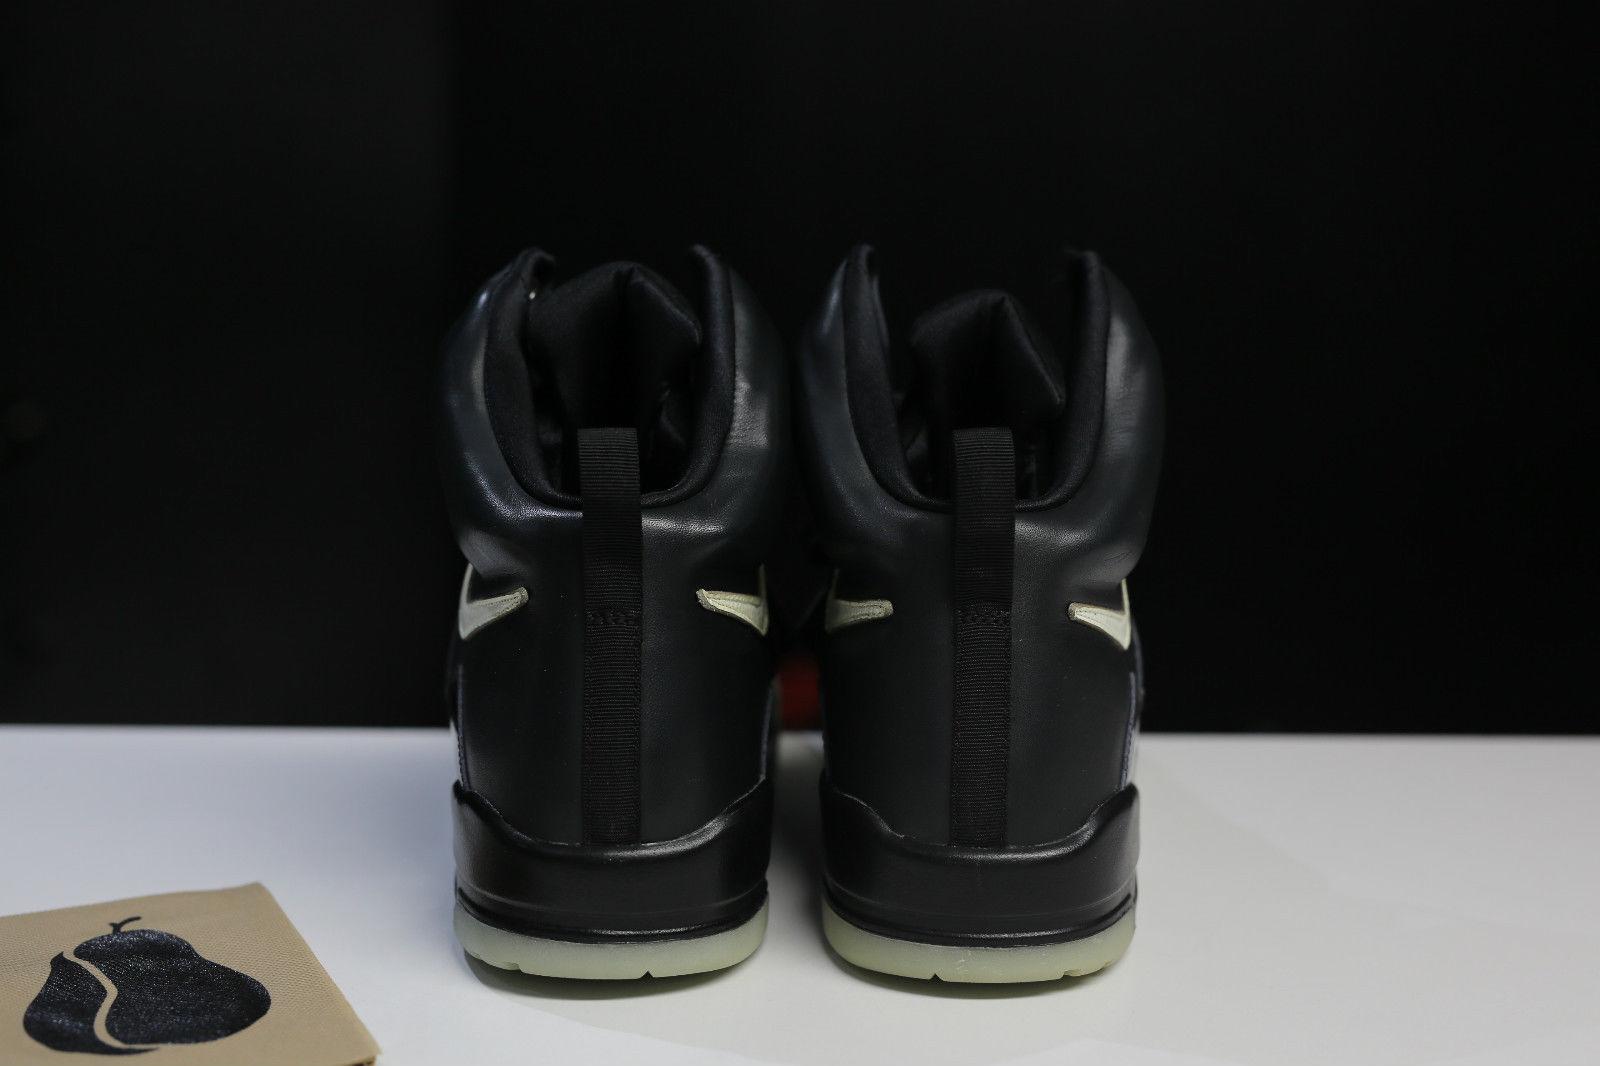 Nike Air Yeezy Kanye West Black/White Sample Heel